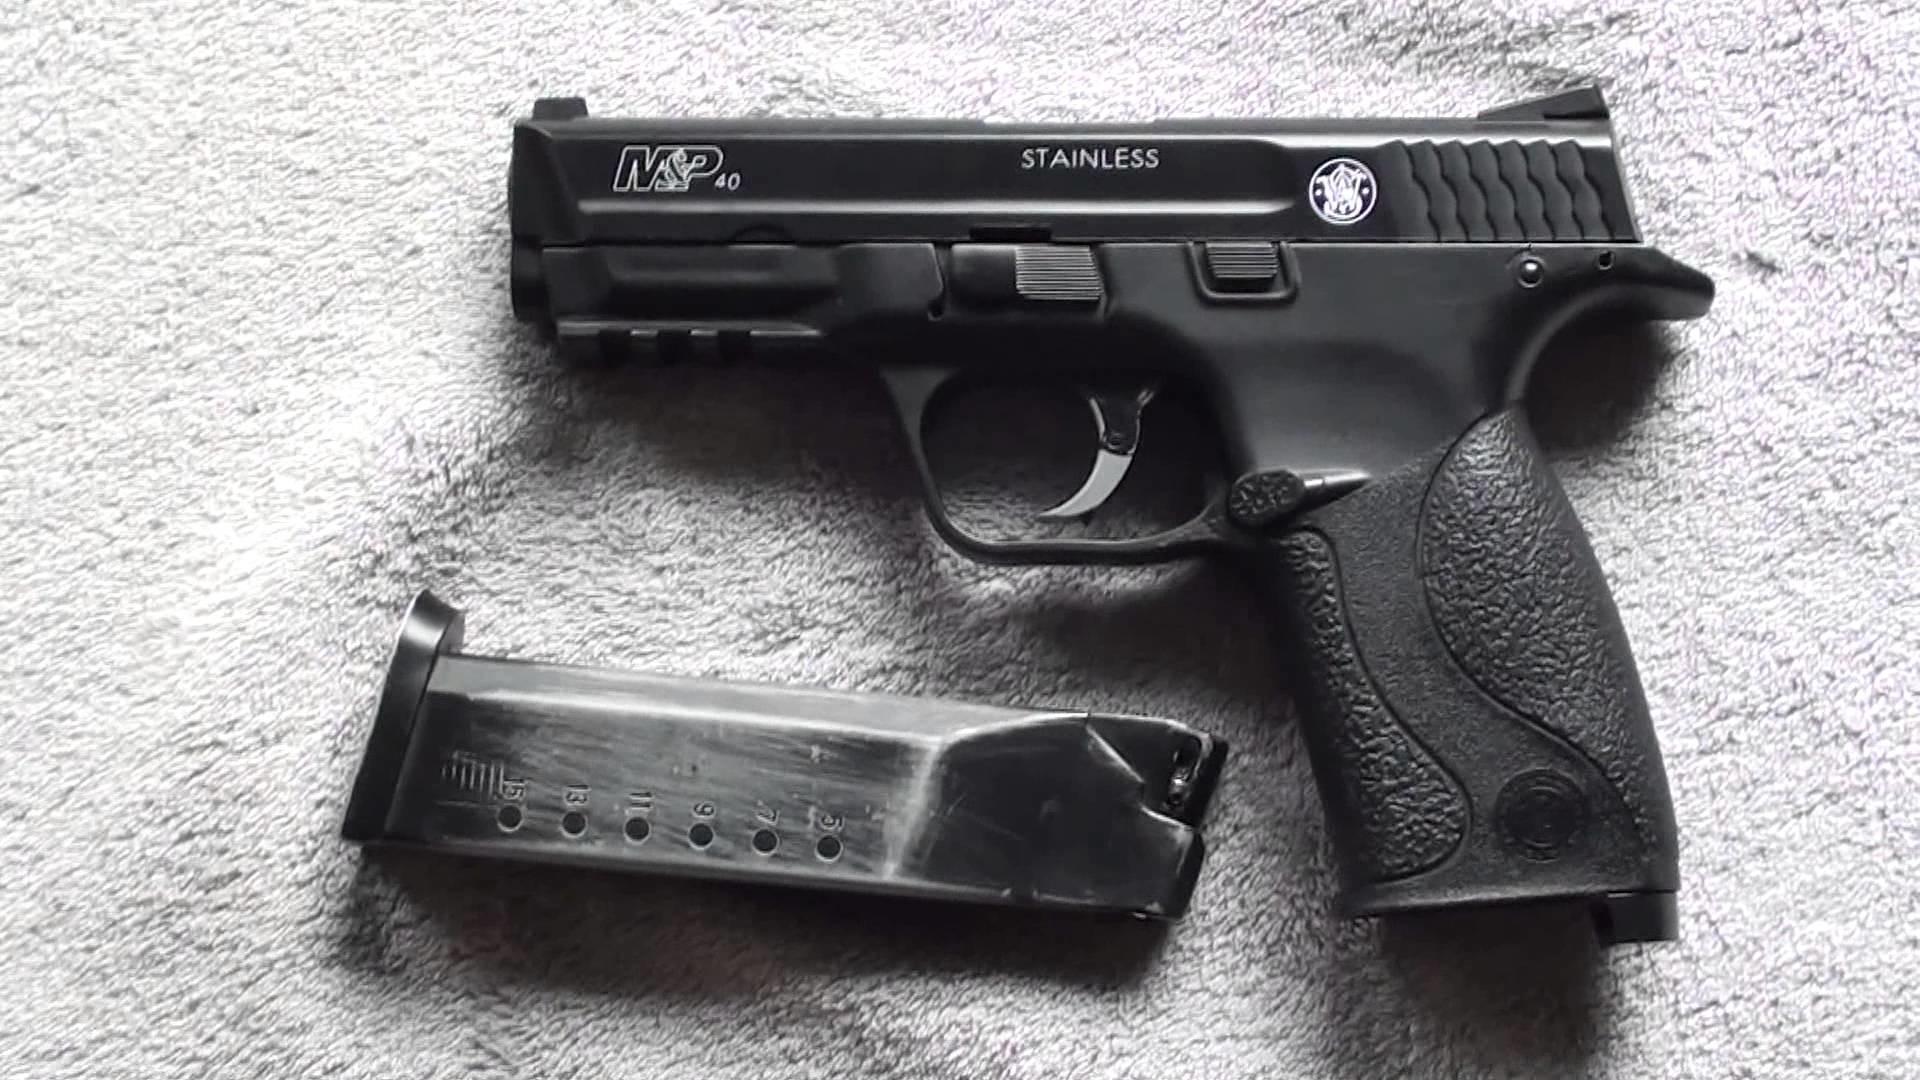 [AIRSOFT] Review fran̤aise du Smith & Wesson M&P40 РYouTube